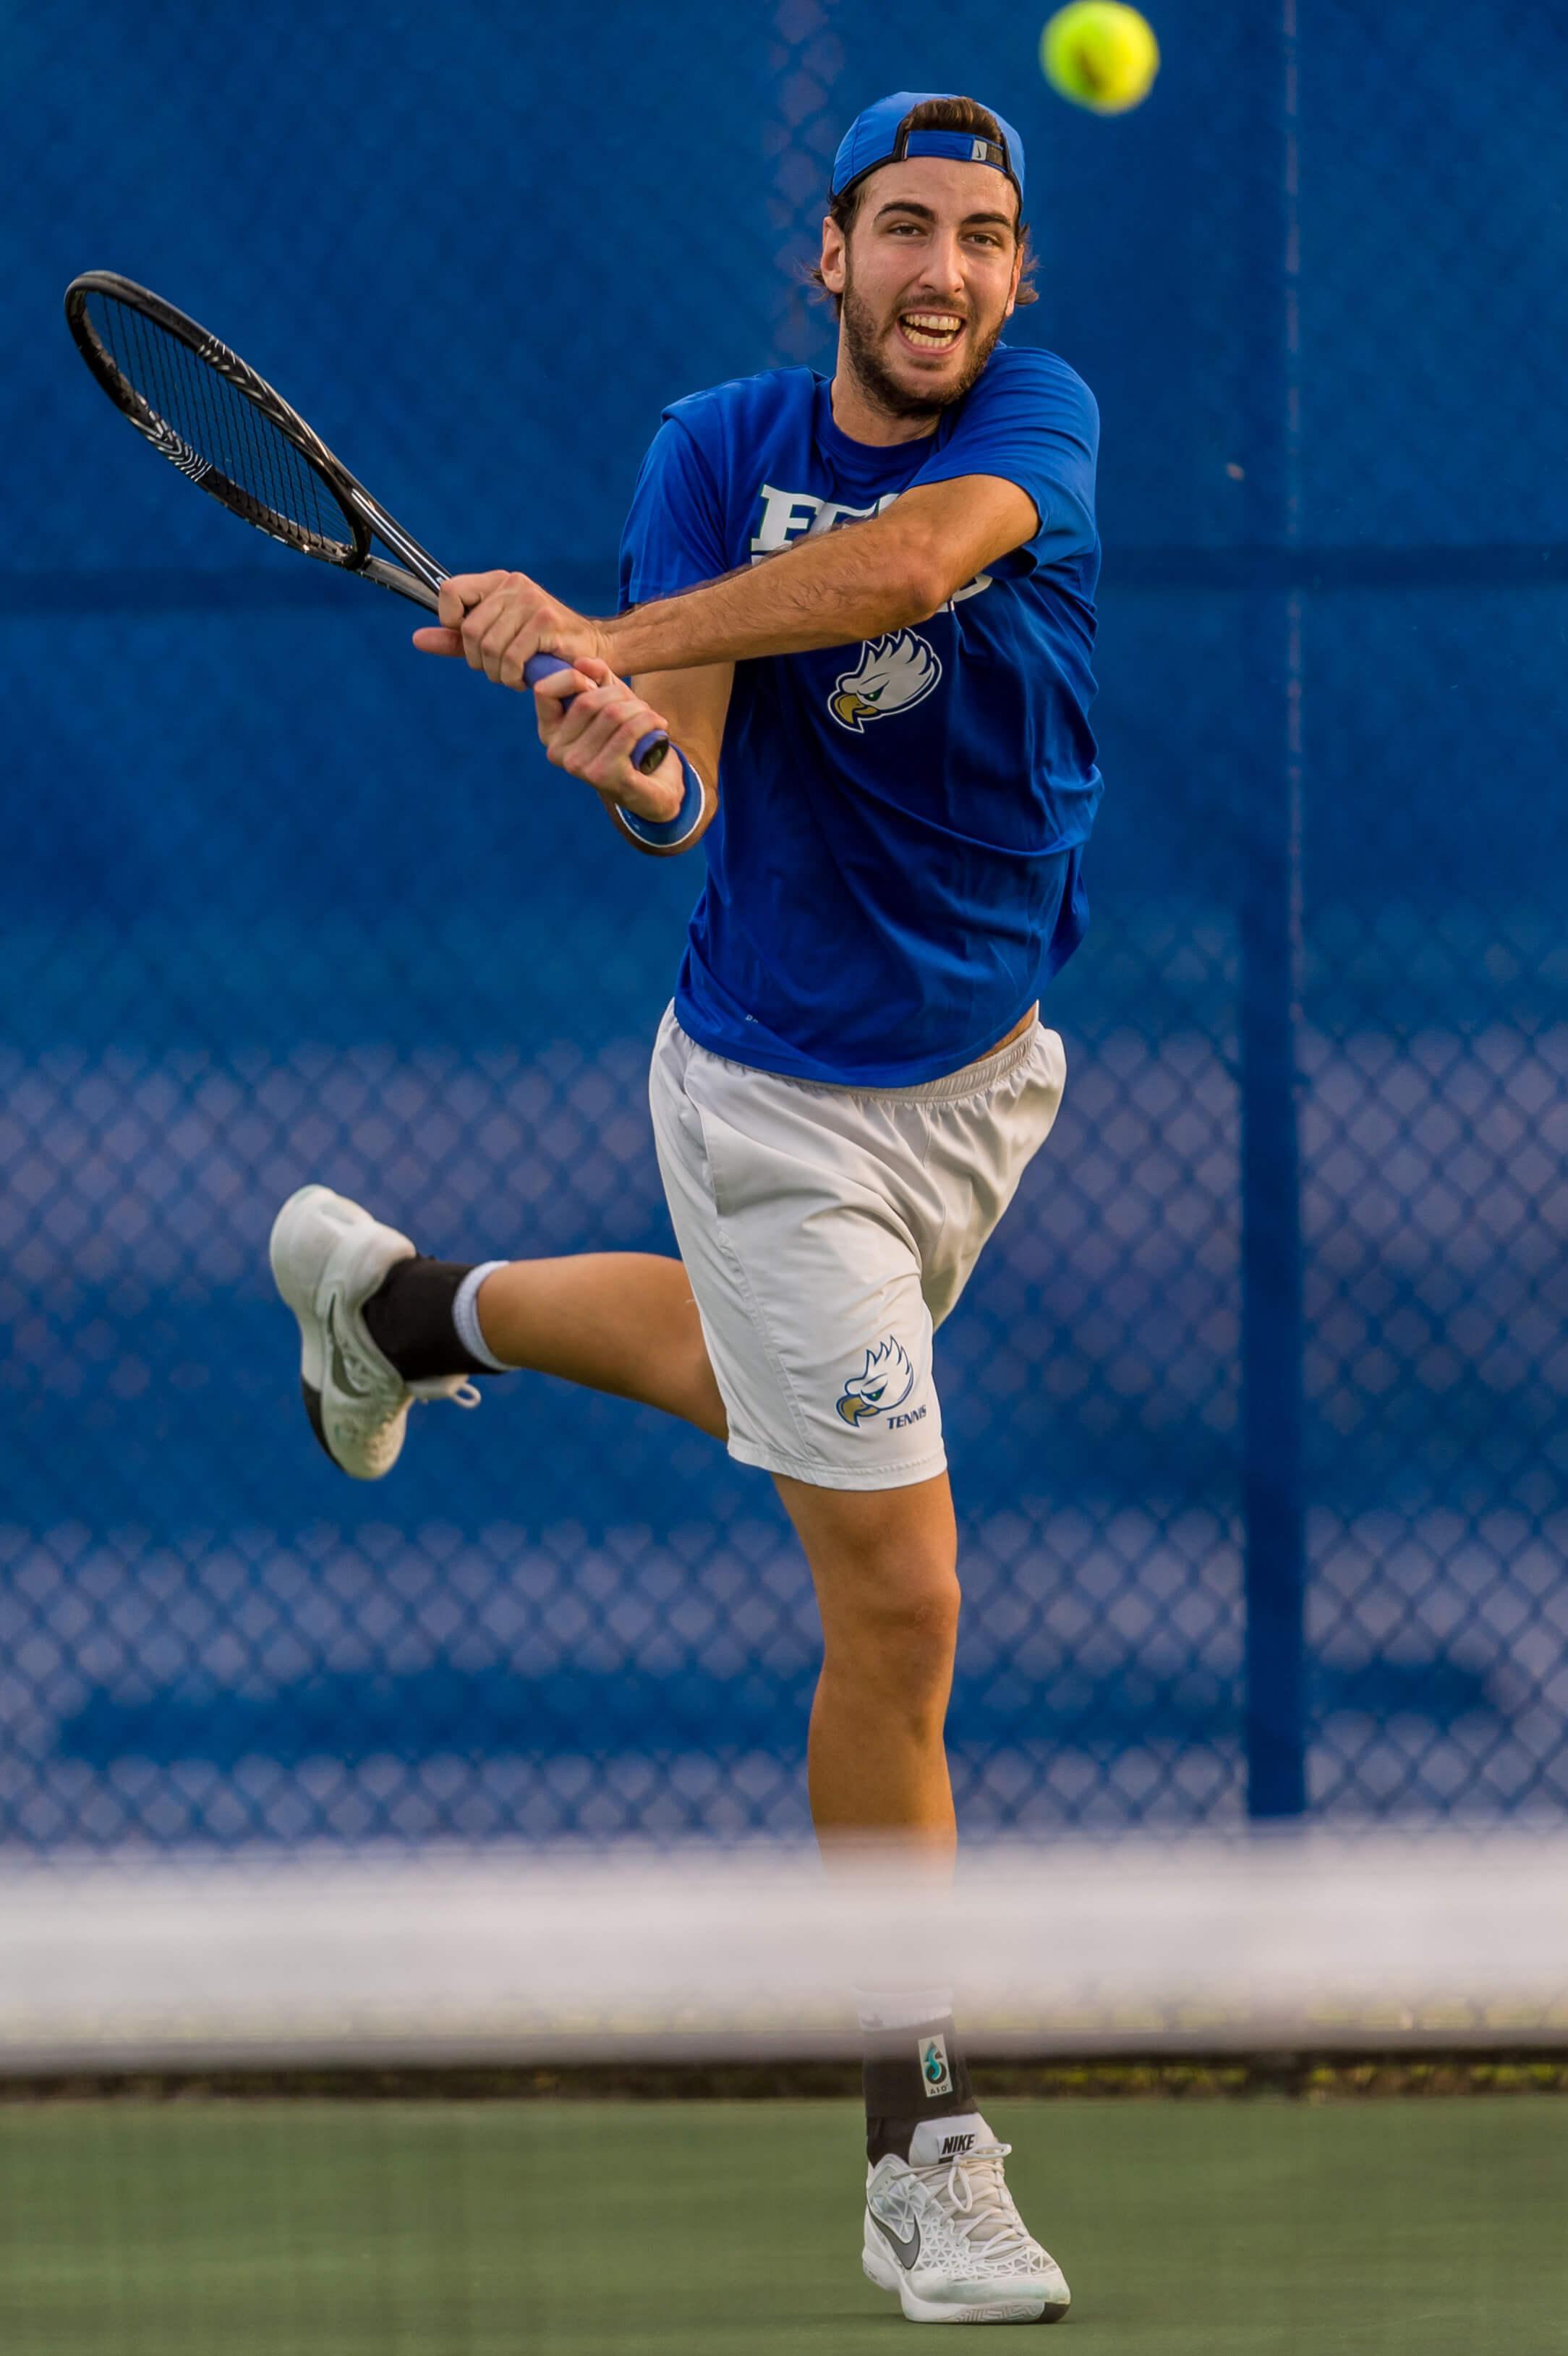 FGCU men's tennis loses to UCF